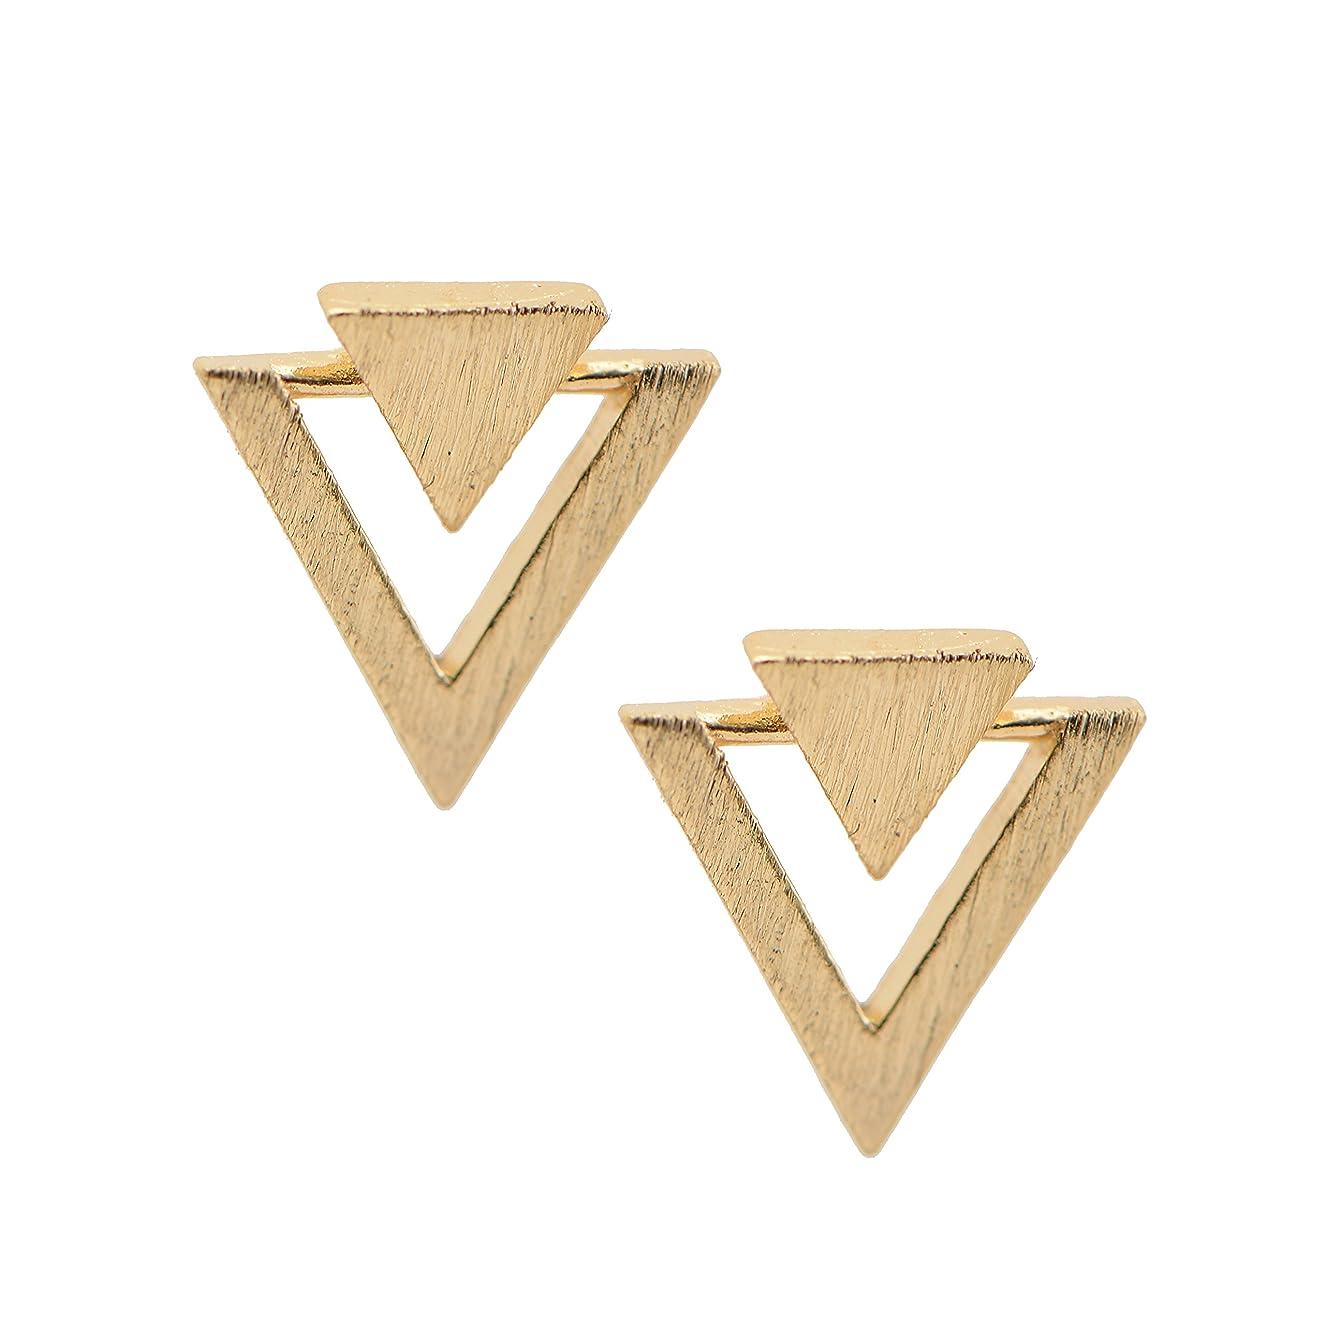 Spinningdaisy Handmade Brushed Metal Double Triangle Earrings